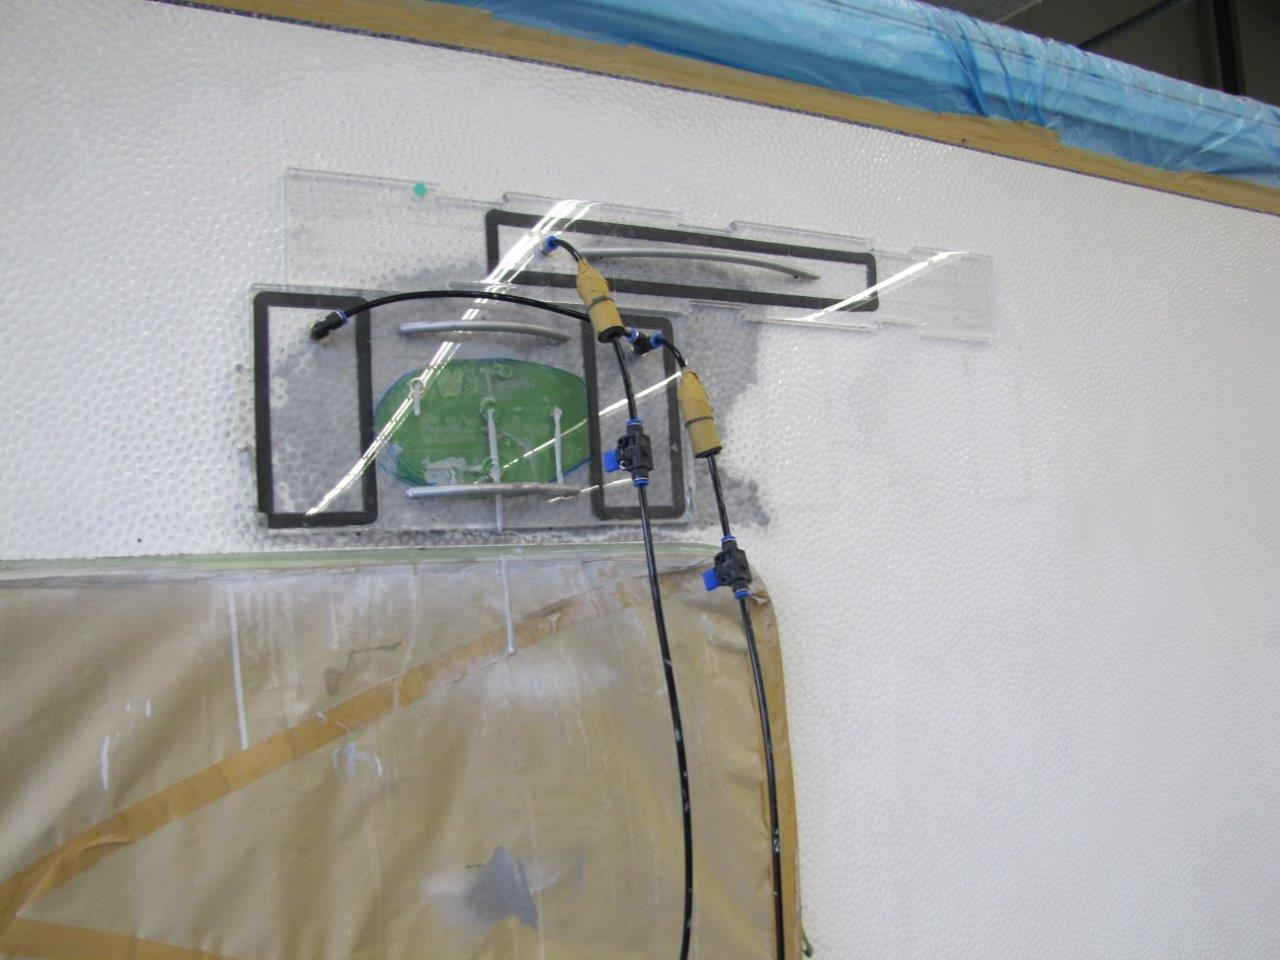 Reparatur mit HBC-Methode (Bild: Fa. Bollwinkel, Bremen)